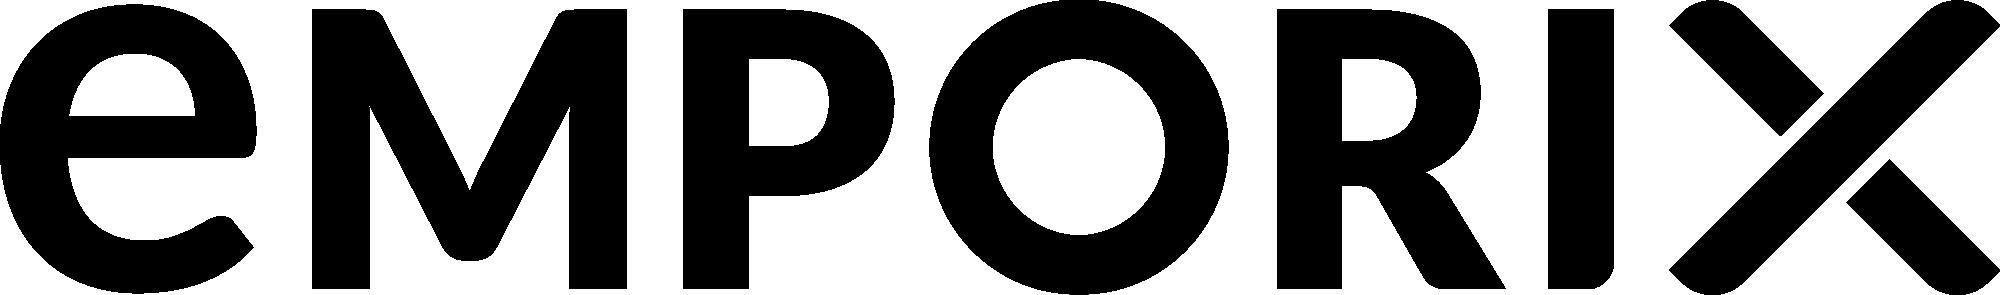 emporix logo